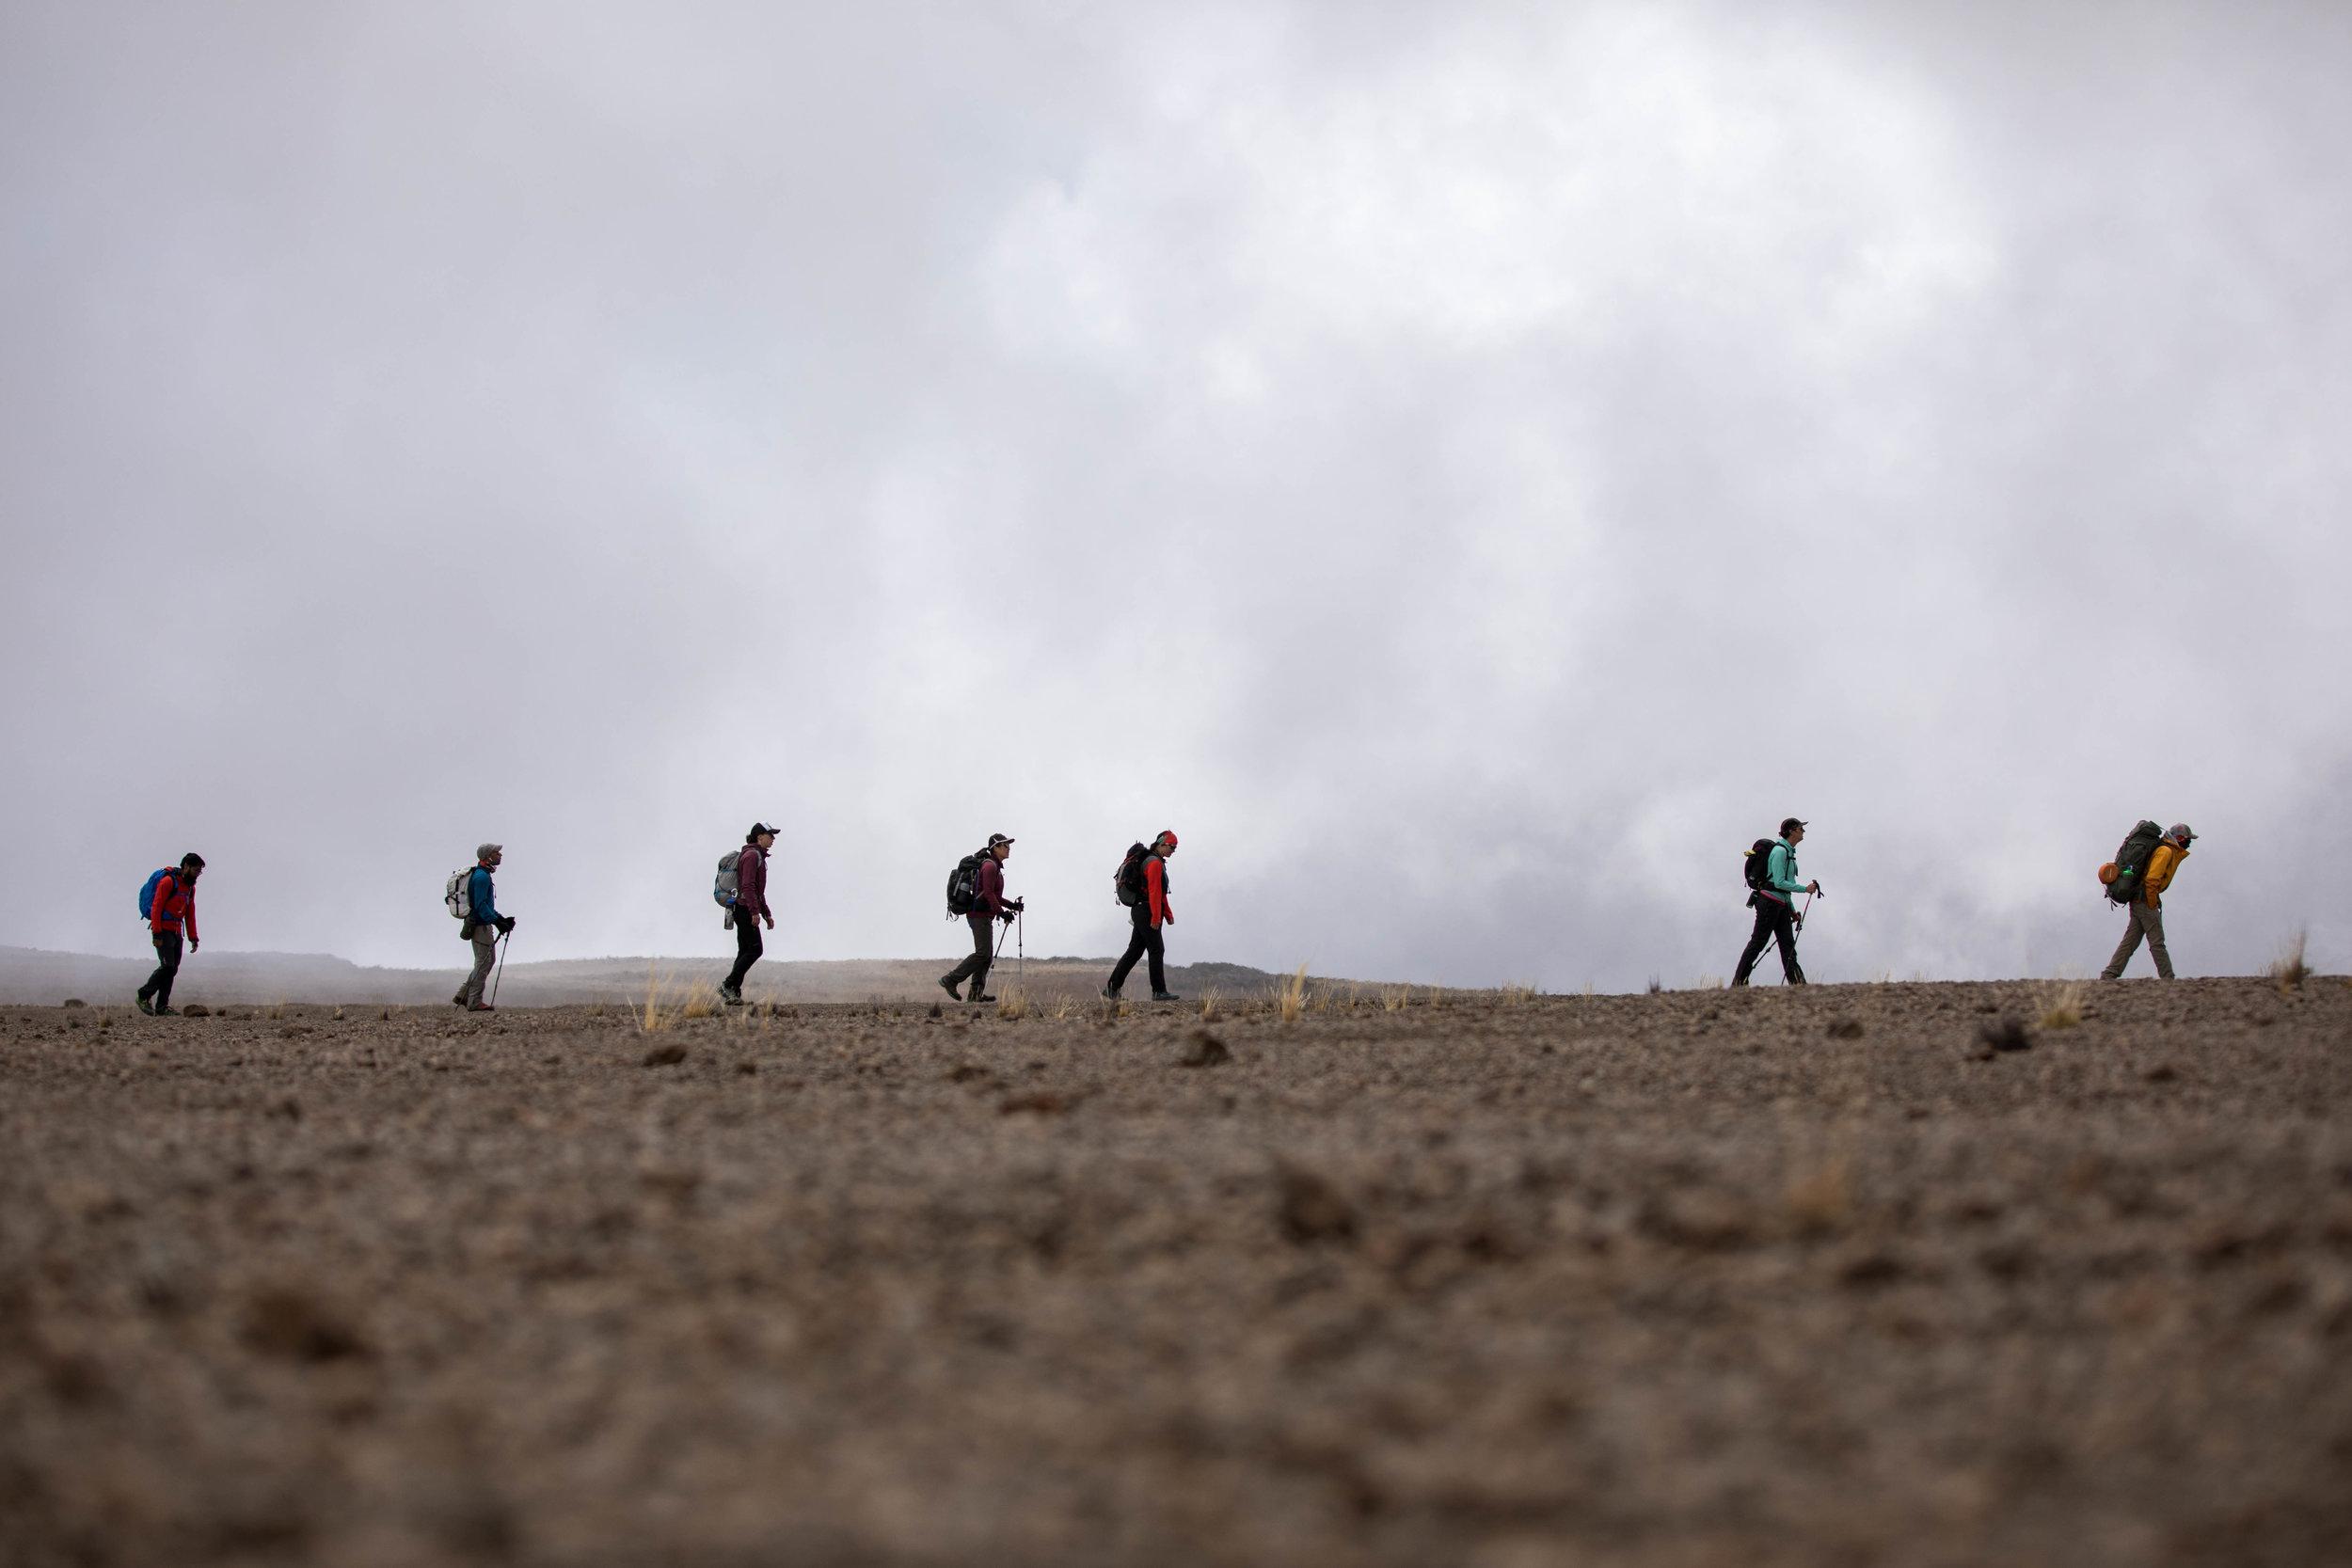 ajw_REI_Kilimanjaro-36.jpg